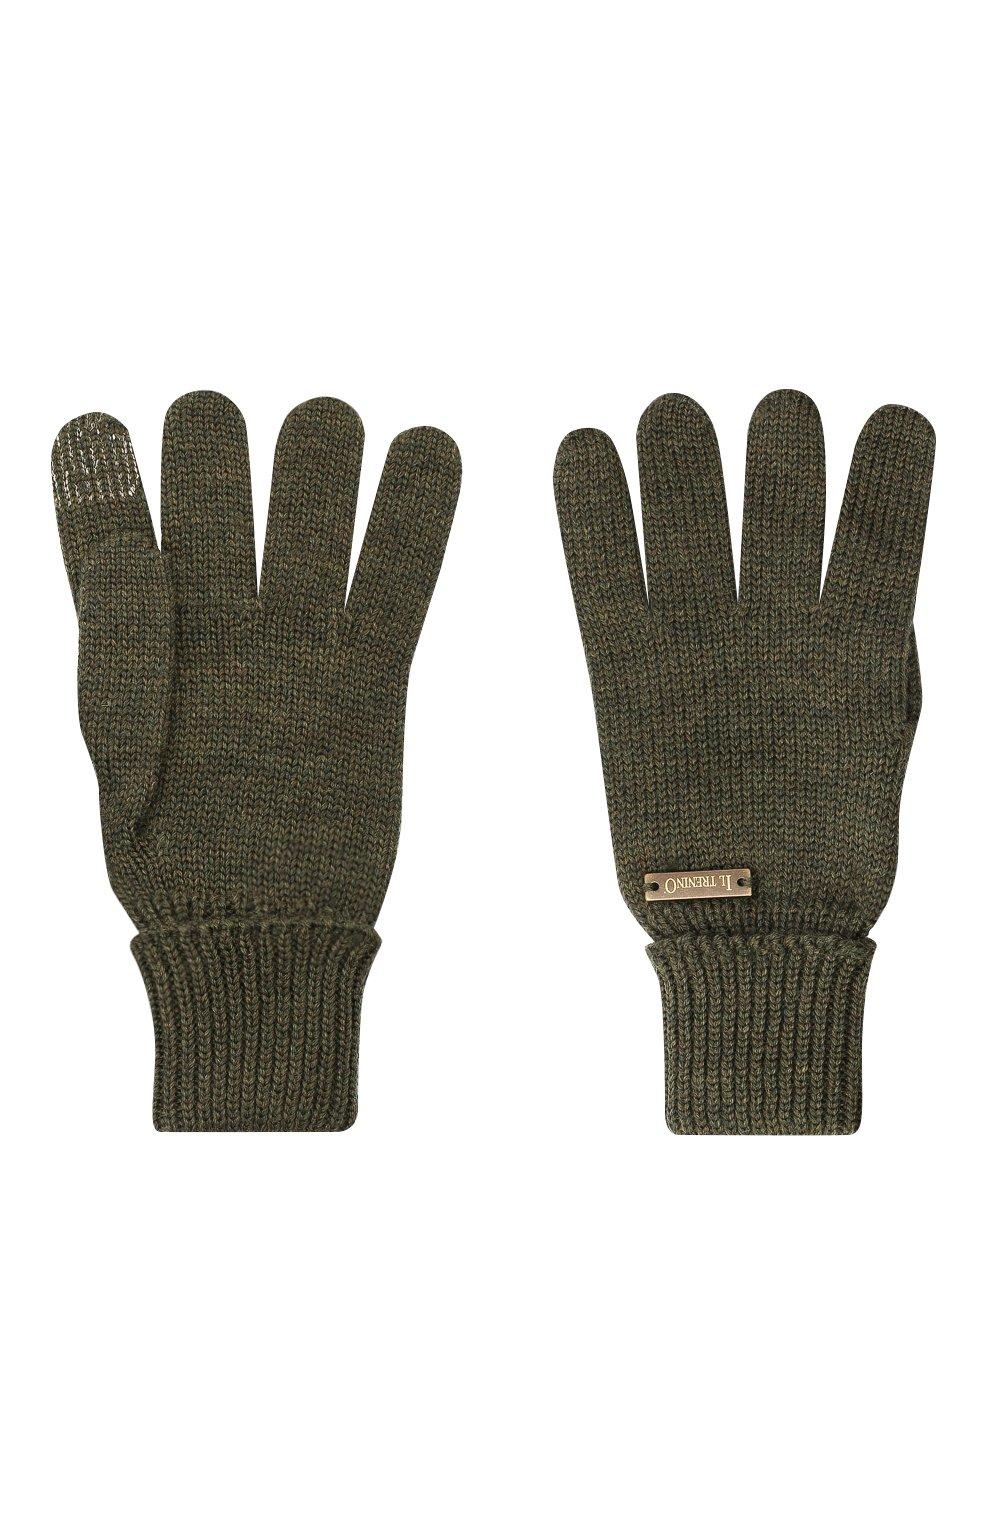 Детские шерстяные перчатки IL TRENINO хаки цвета, арт. 20 4056/E0 | Фото 2